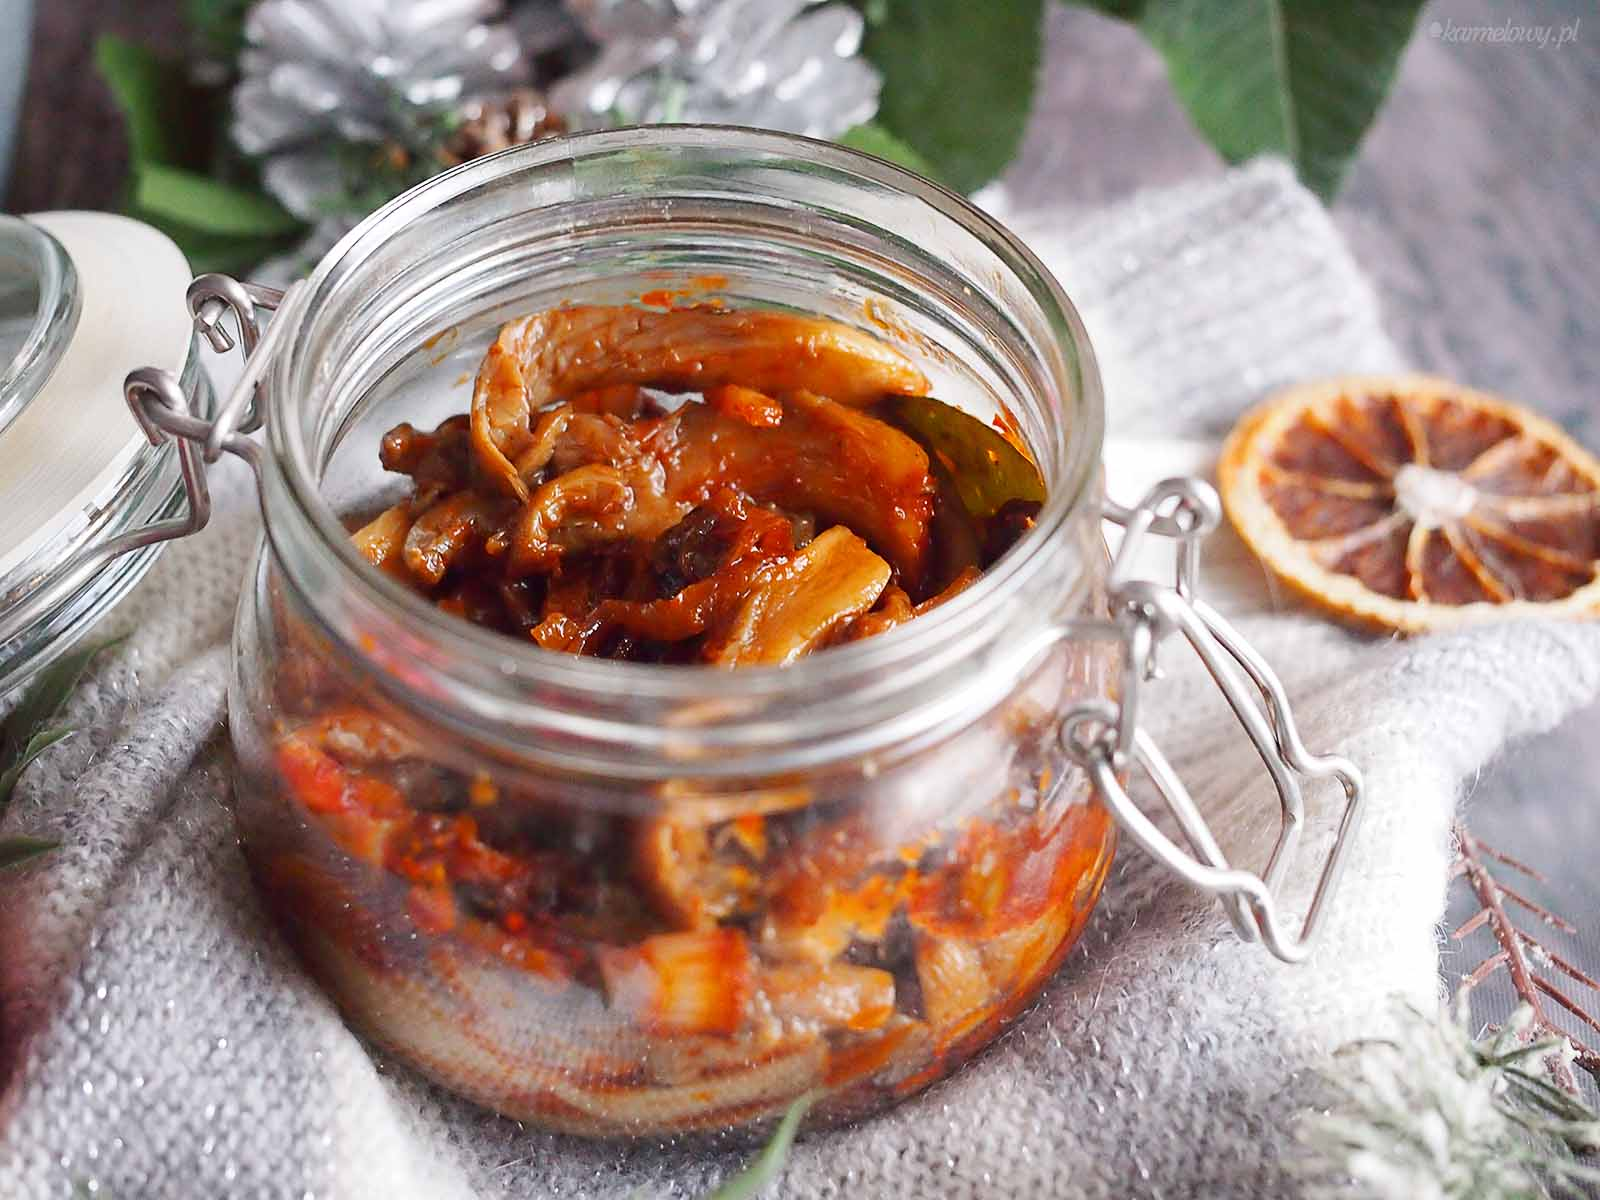 Boczniaki-po-kaszubsku-Tomato-oyster-mushrooms-with-raisins